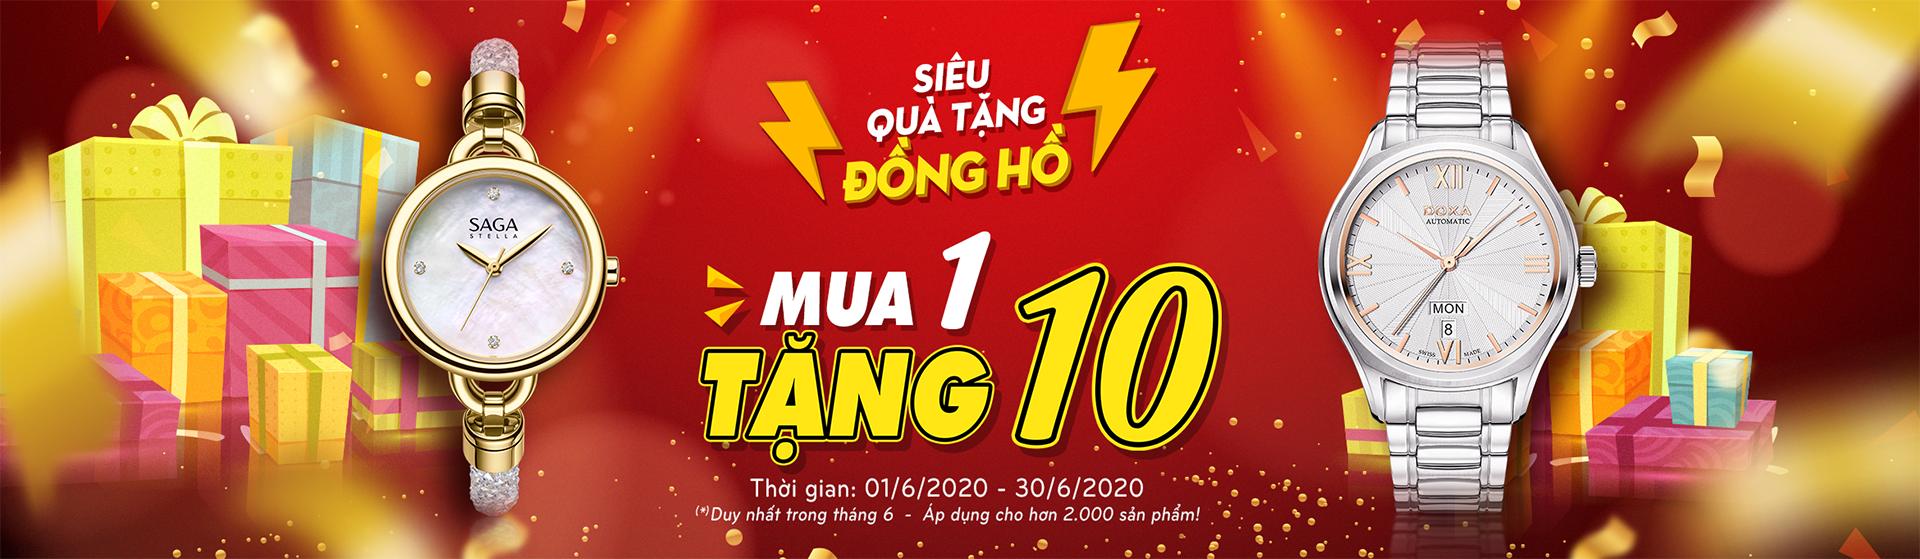 chuong trinh mua 1 tang 10